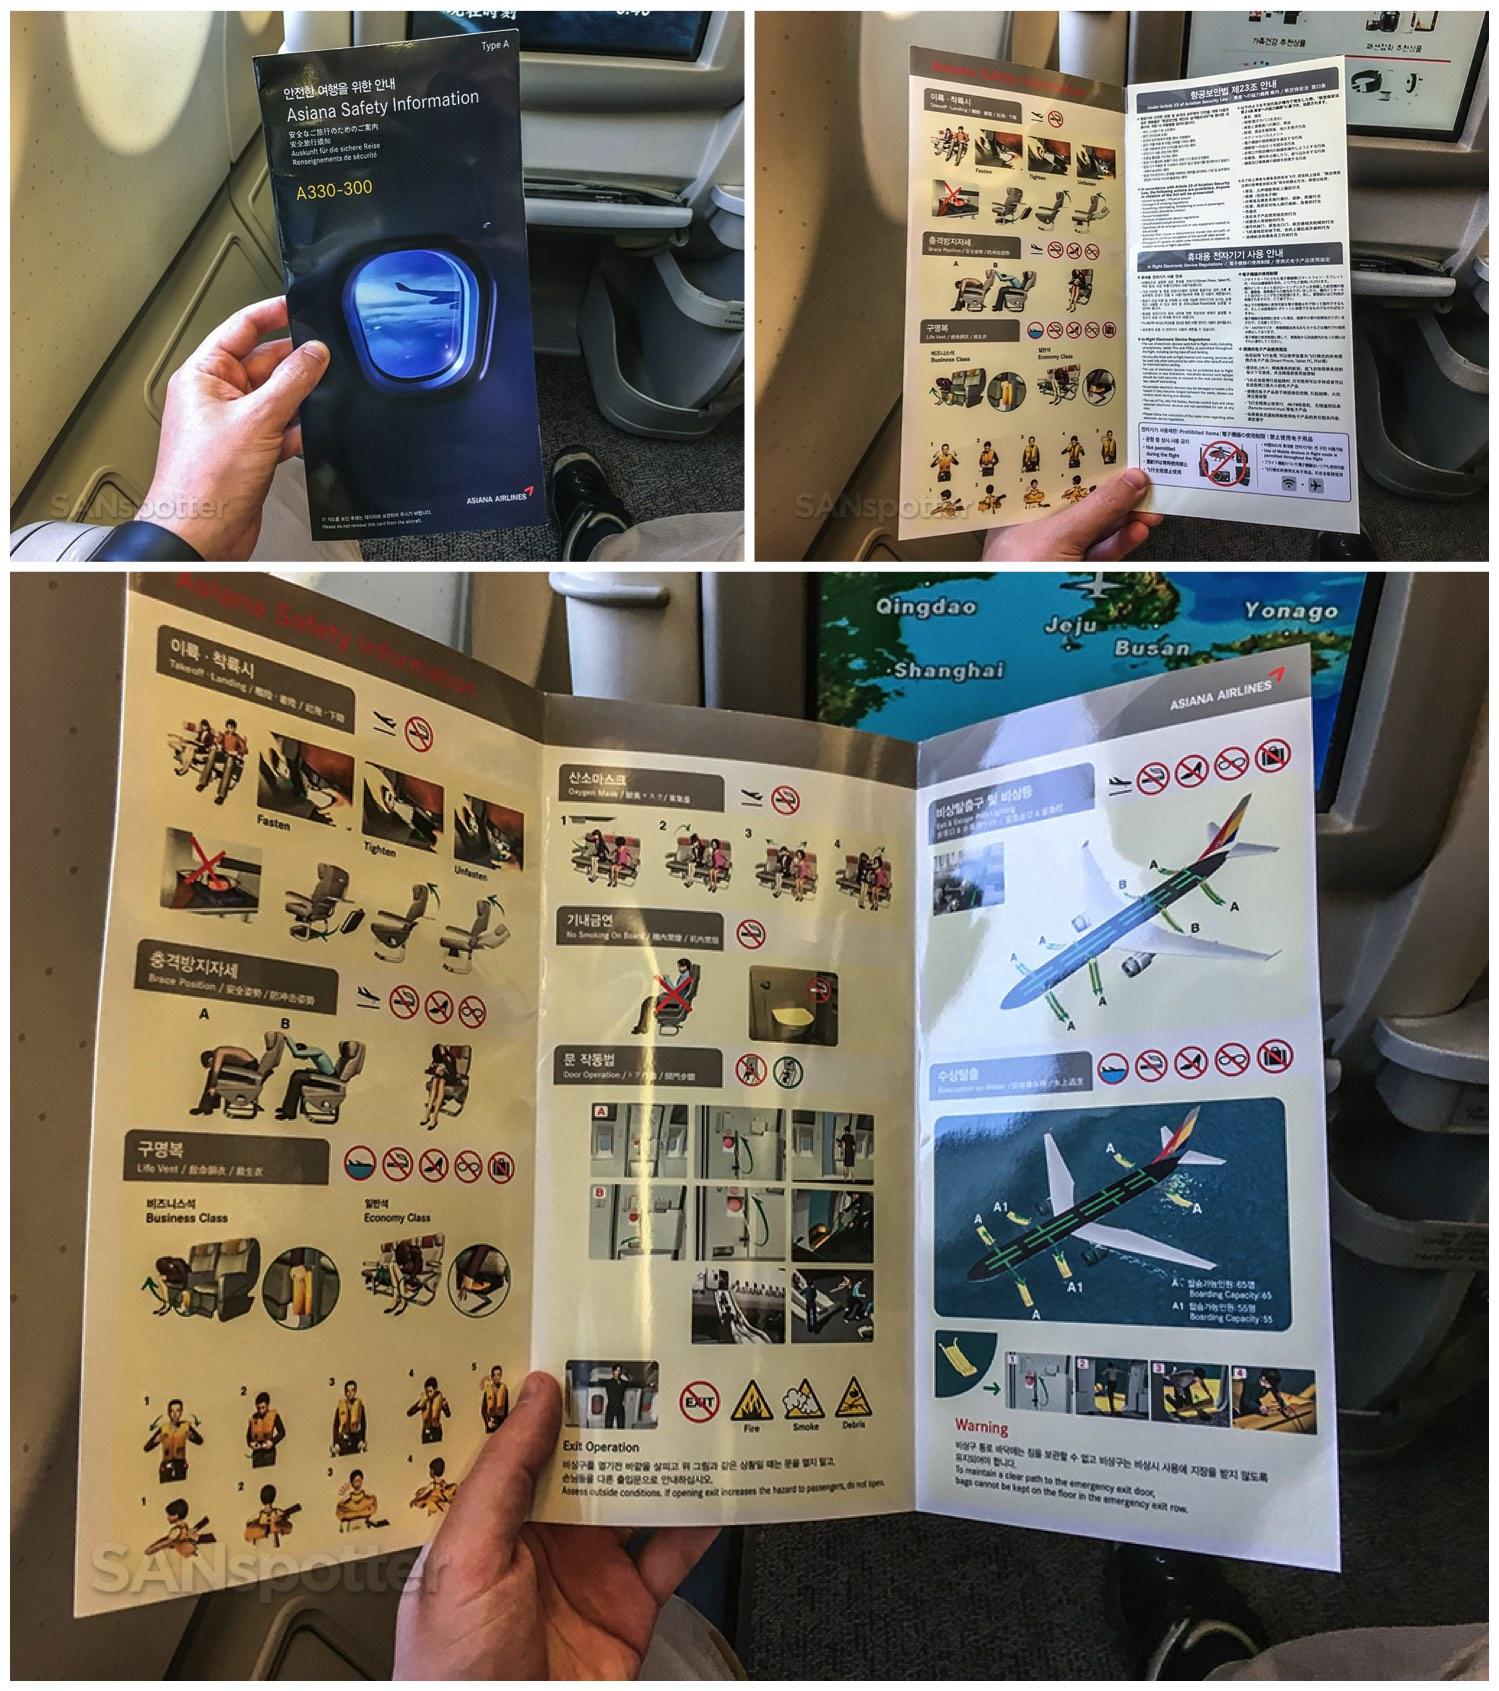 Asiana A330-300 safety card